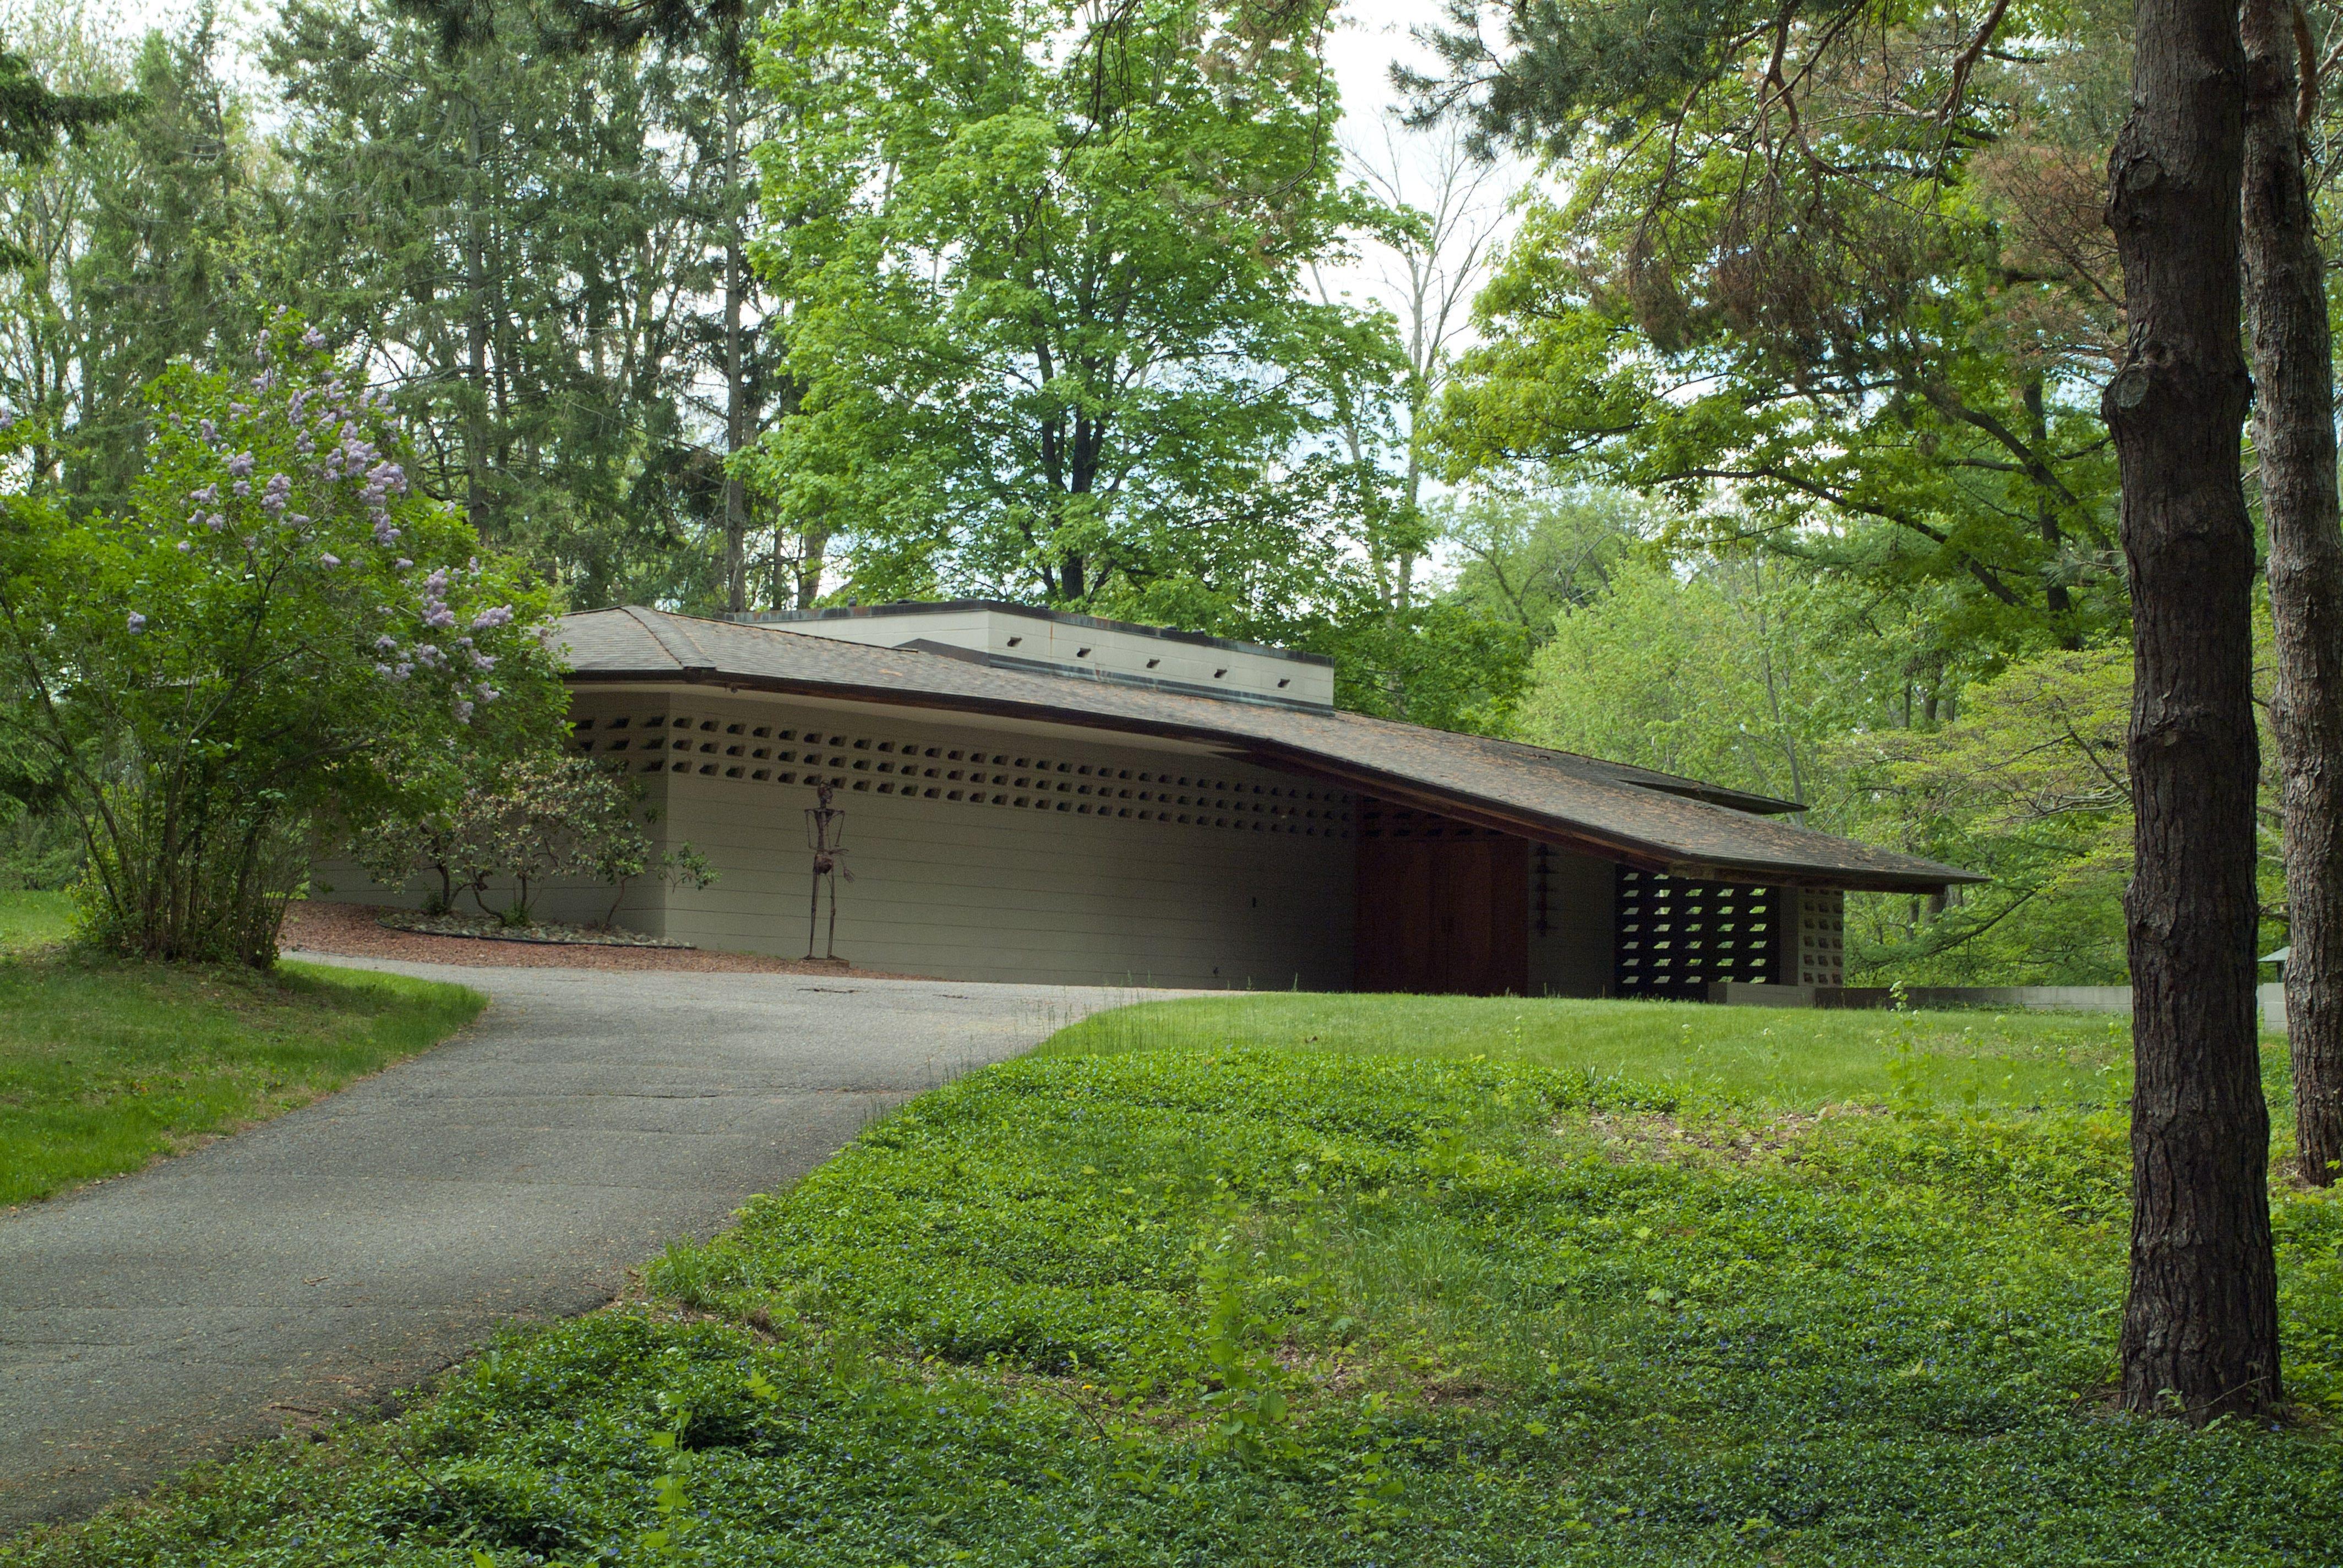 Okemosu0027 Four Frank Lloyd Wright Homes On Tour To Mark Architectu0027s 150th  Birthday